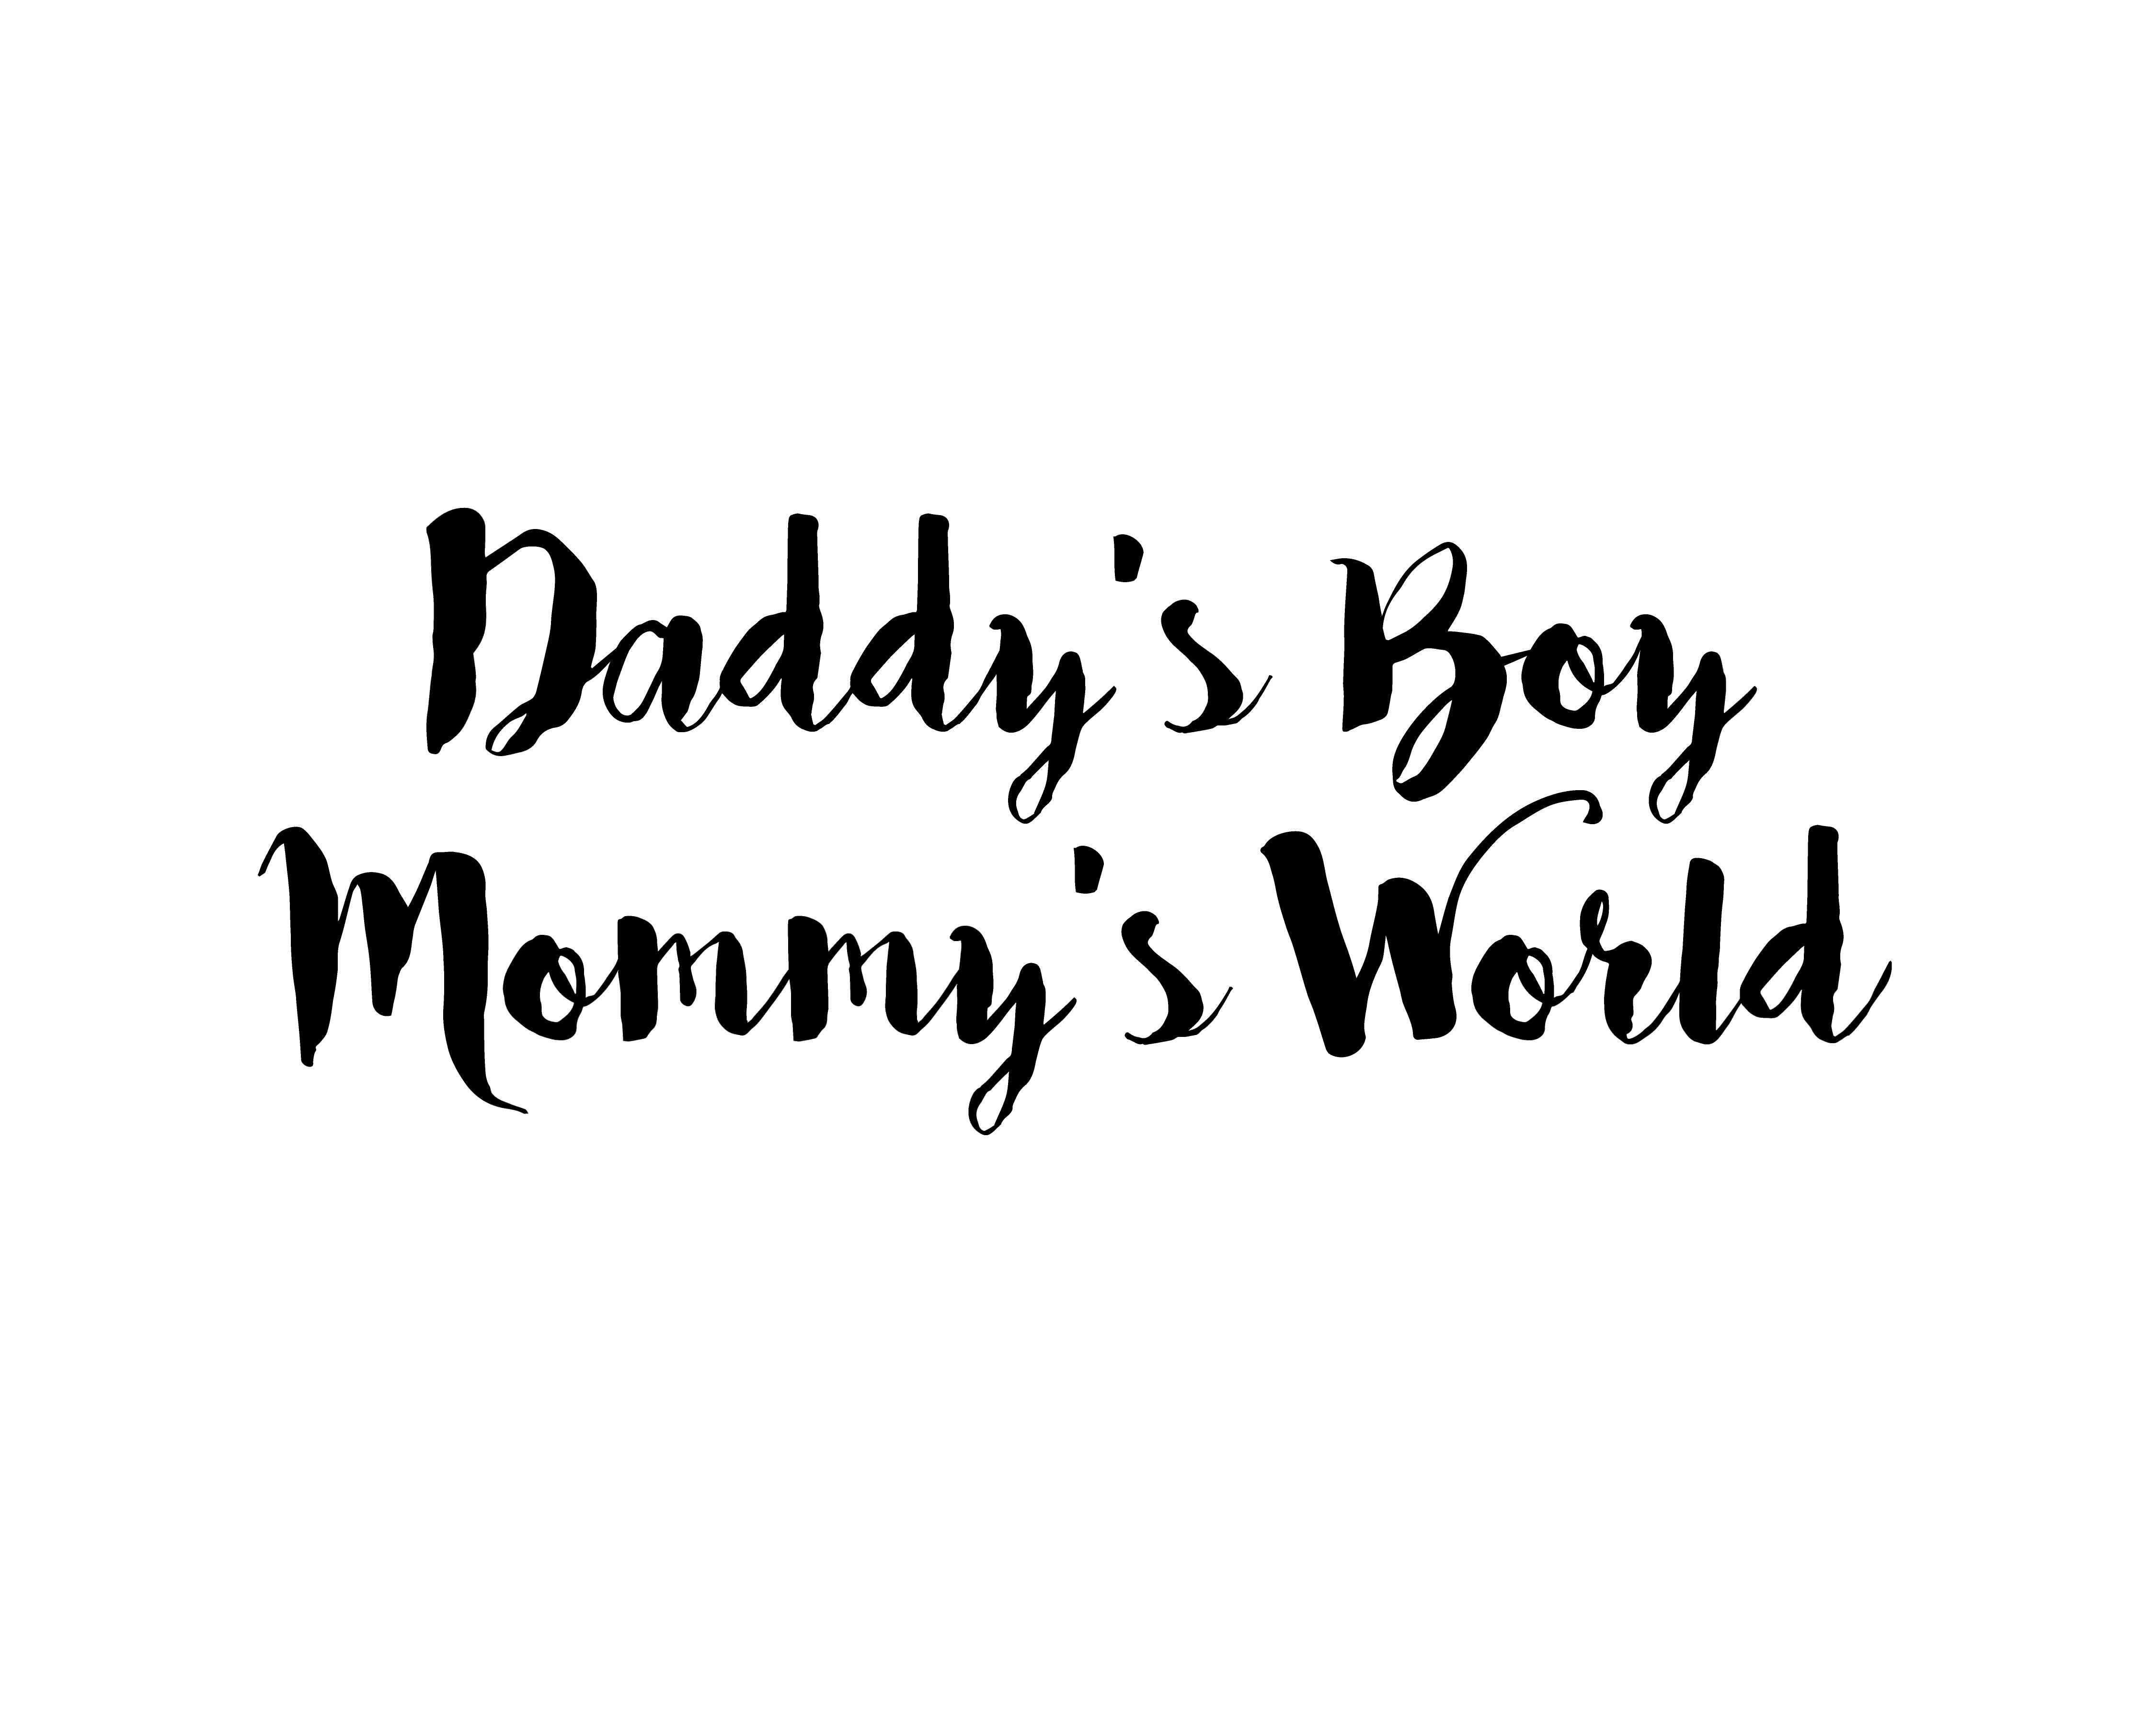 Printable Room Decor Daddys Boy Mommys World Free Nursery Room Home Decor Printable